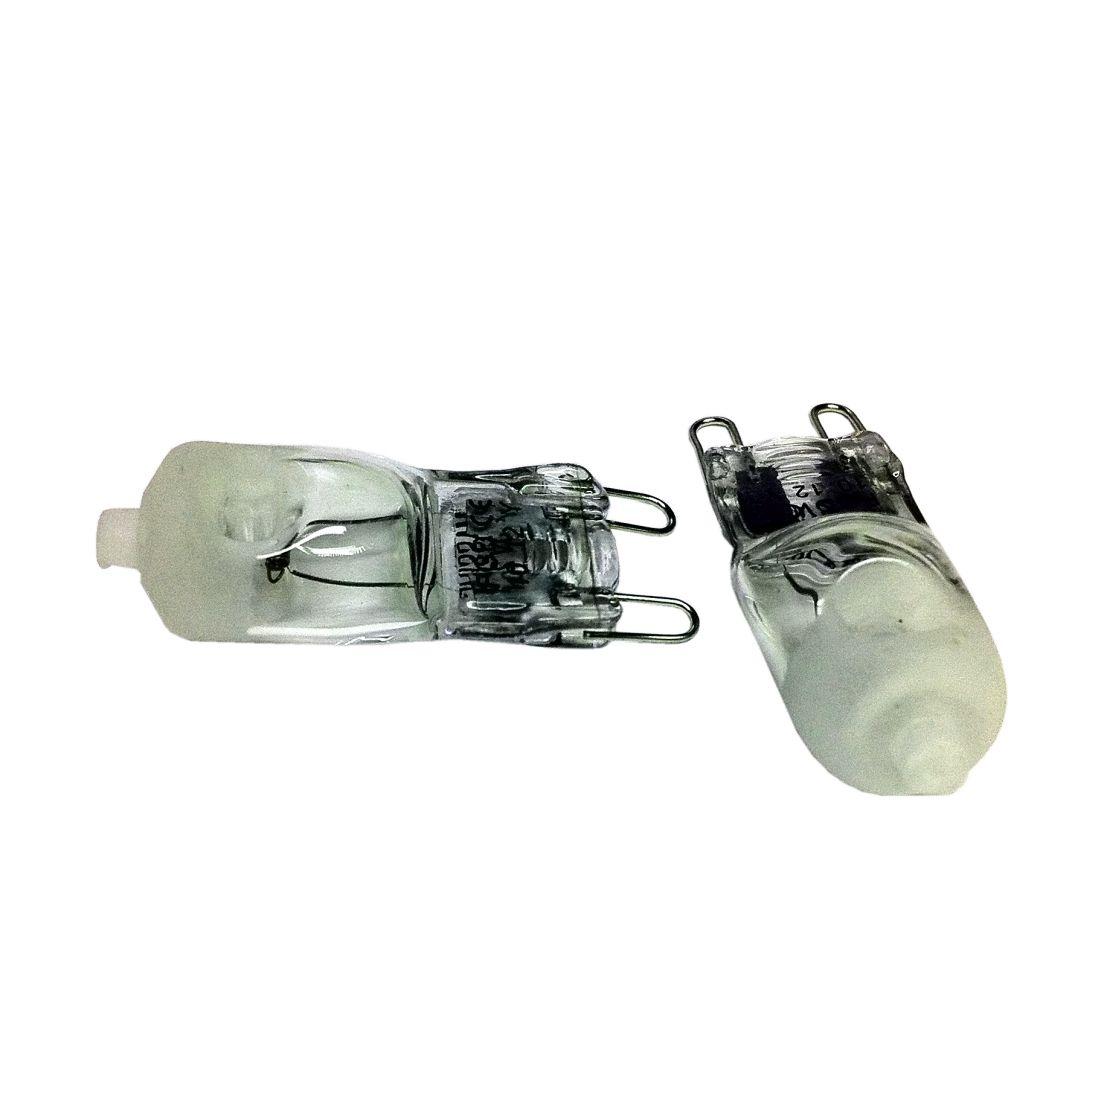 70w T8 Fluorescent tube (5400K, daylight, triphosphor, 6ft ...